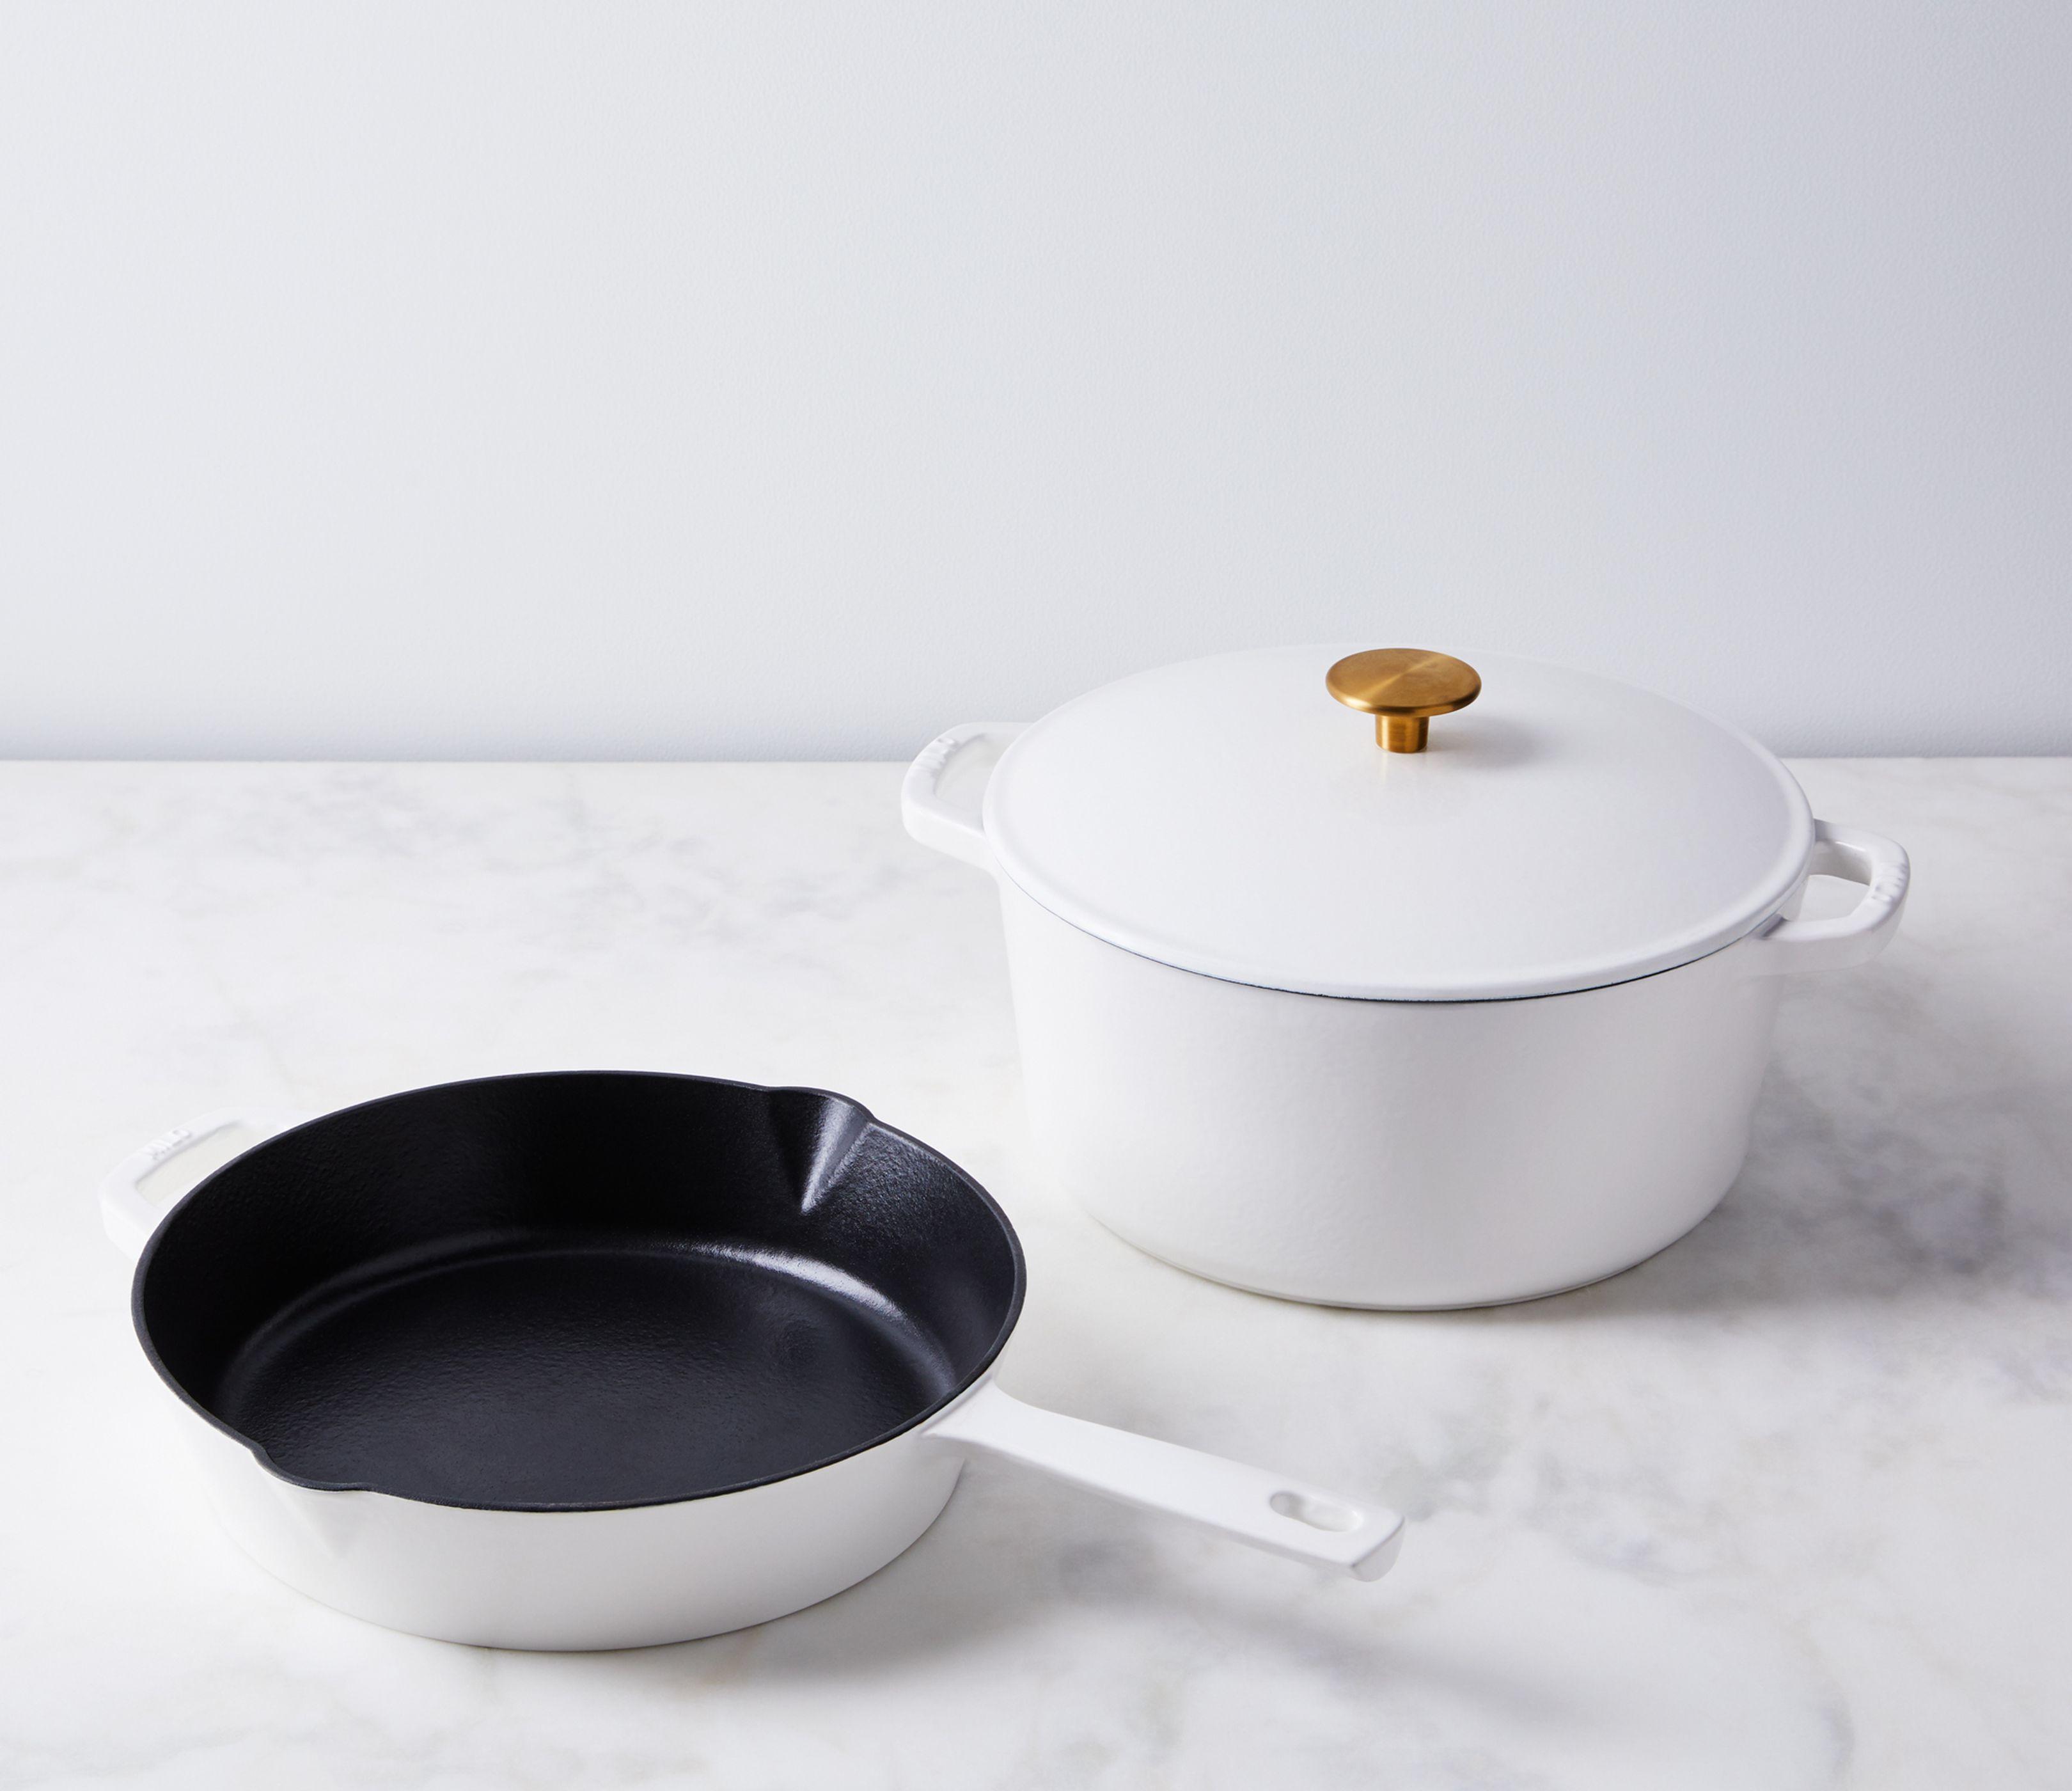 Food52 X Milo Cast Iron Cookware On